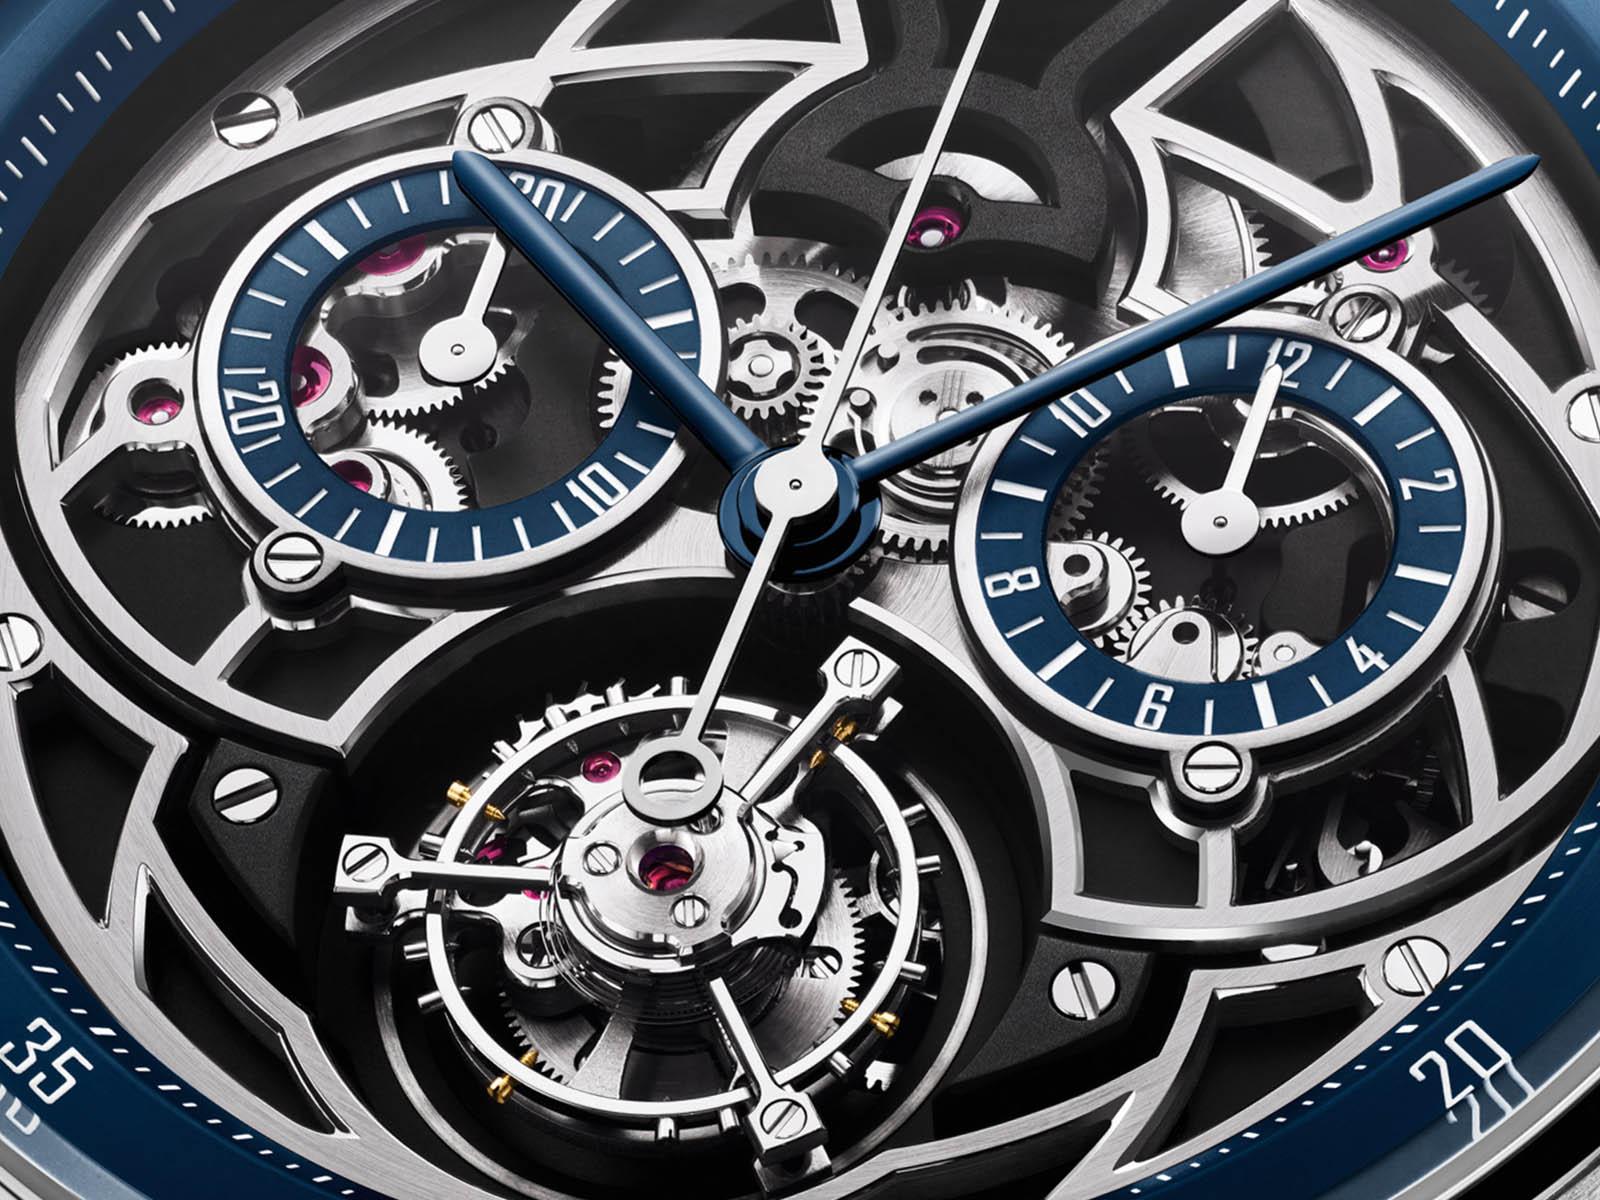 26399bc-oo-d321cr-01-audemars-piguet-code-11-59-flying-tourbillon-chronograph-7.jpg